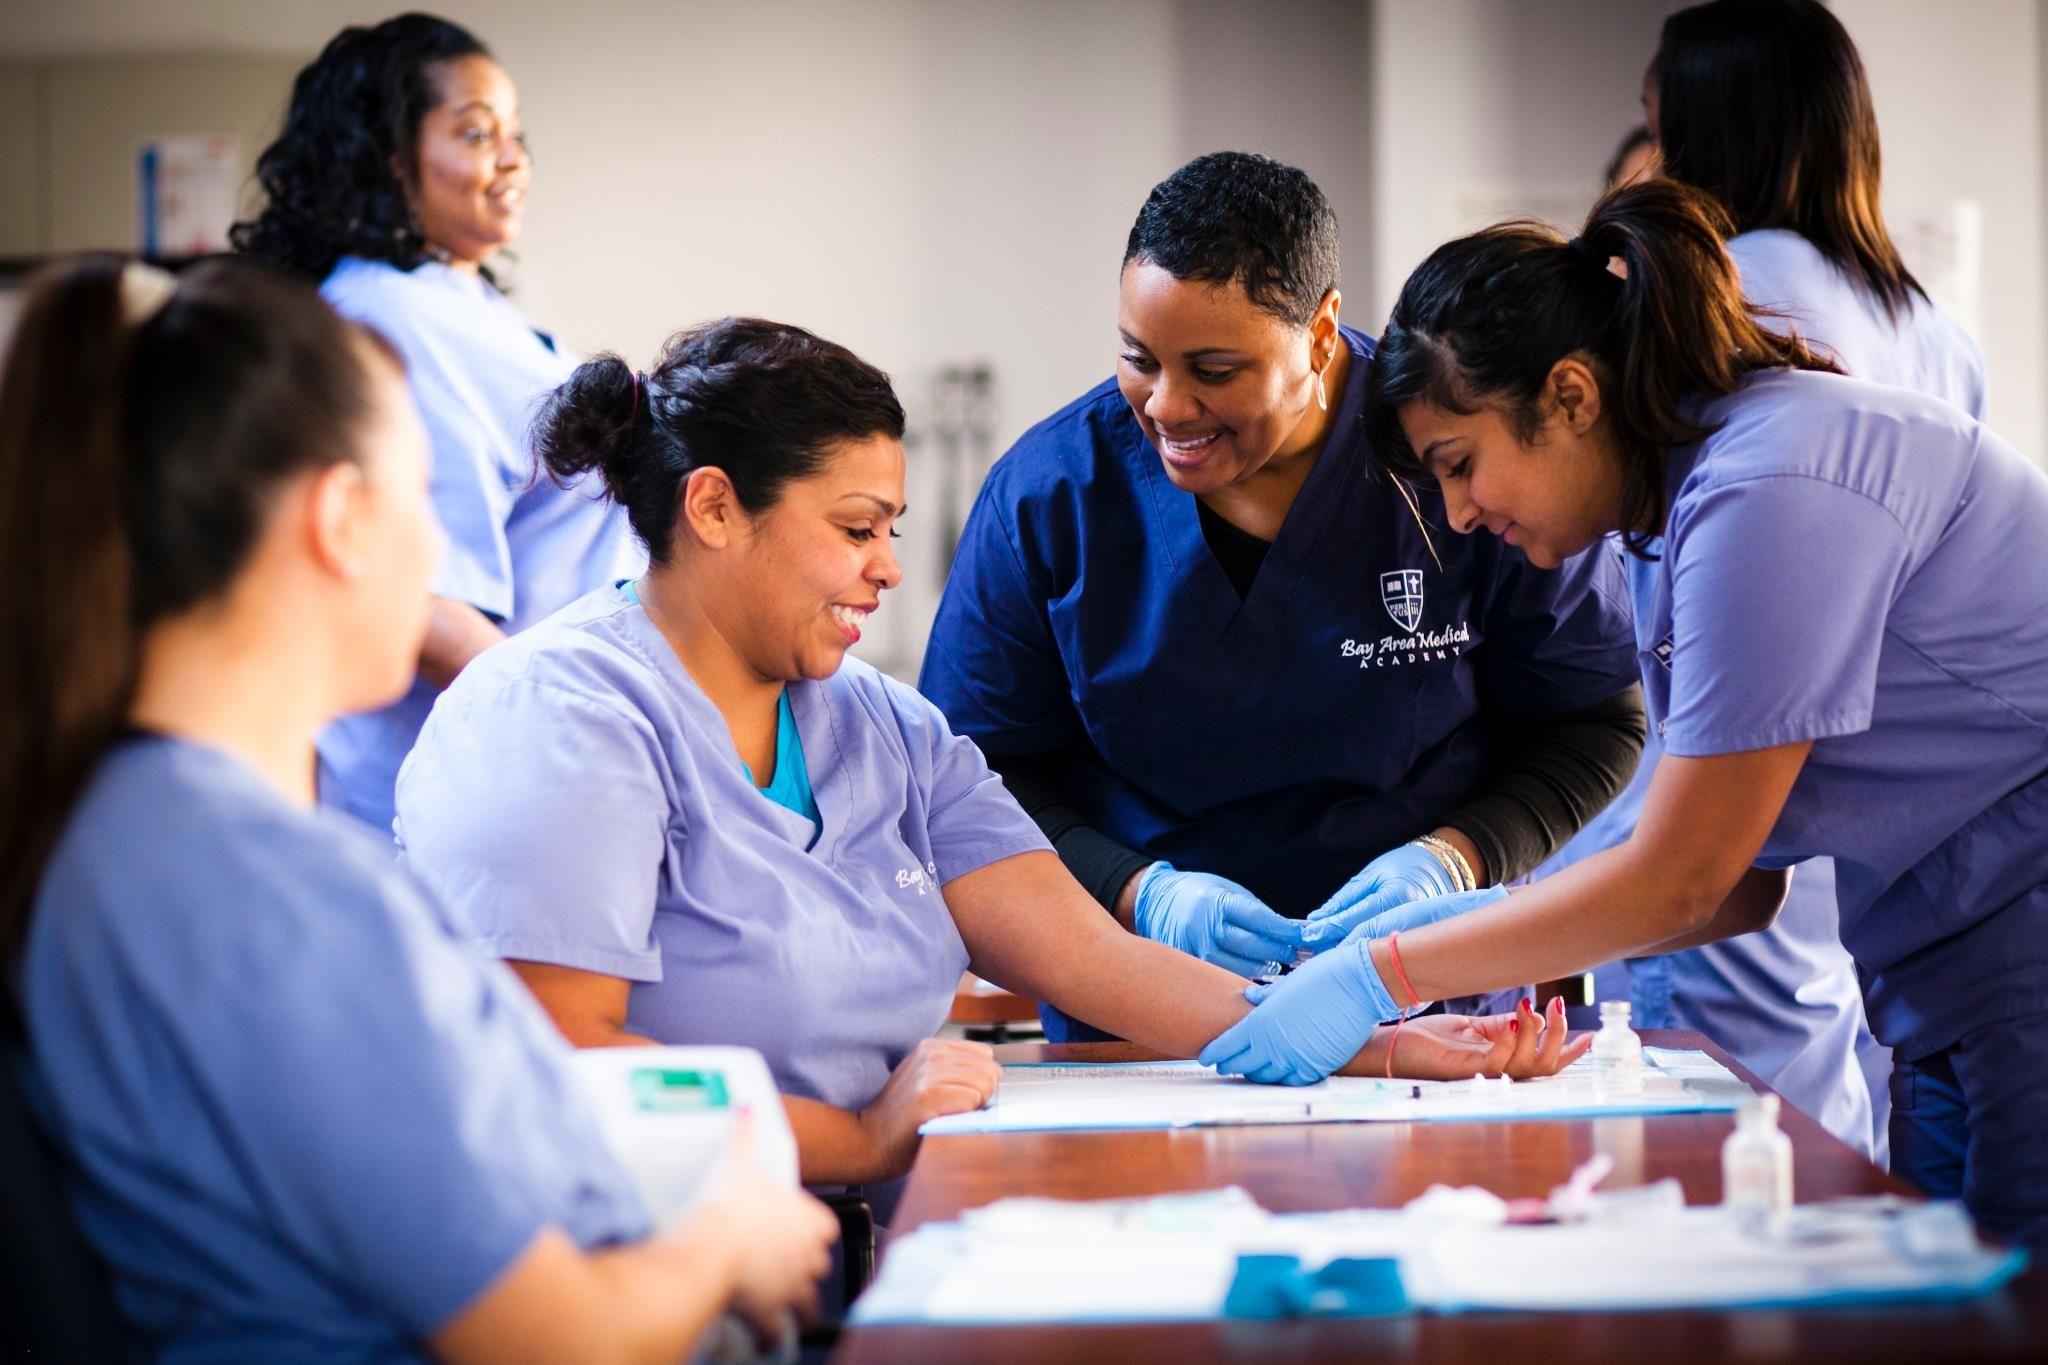 Bamas Medical Assistant Program Includes Ekg And Phlebotomy